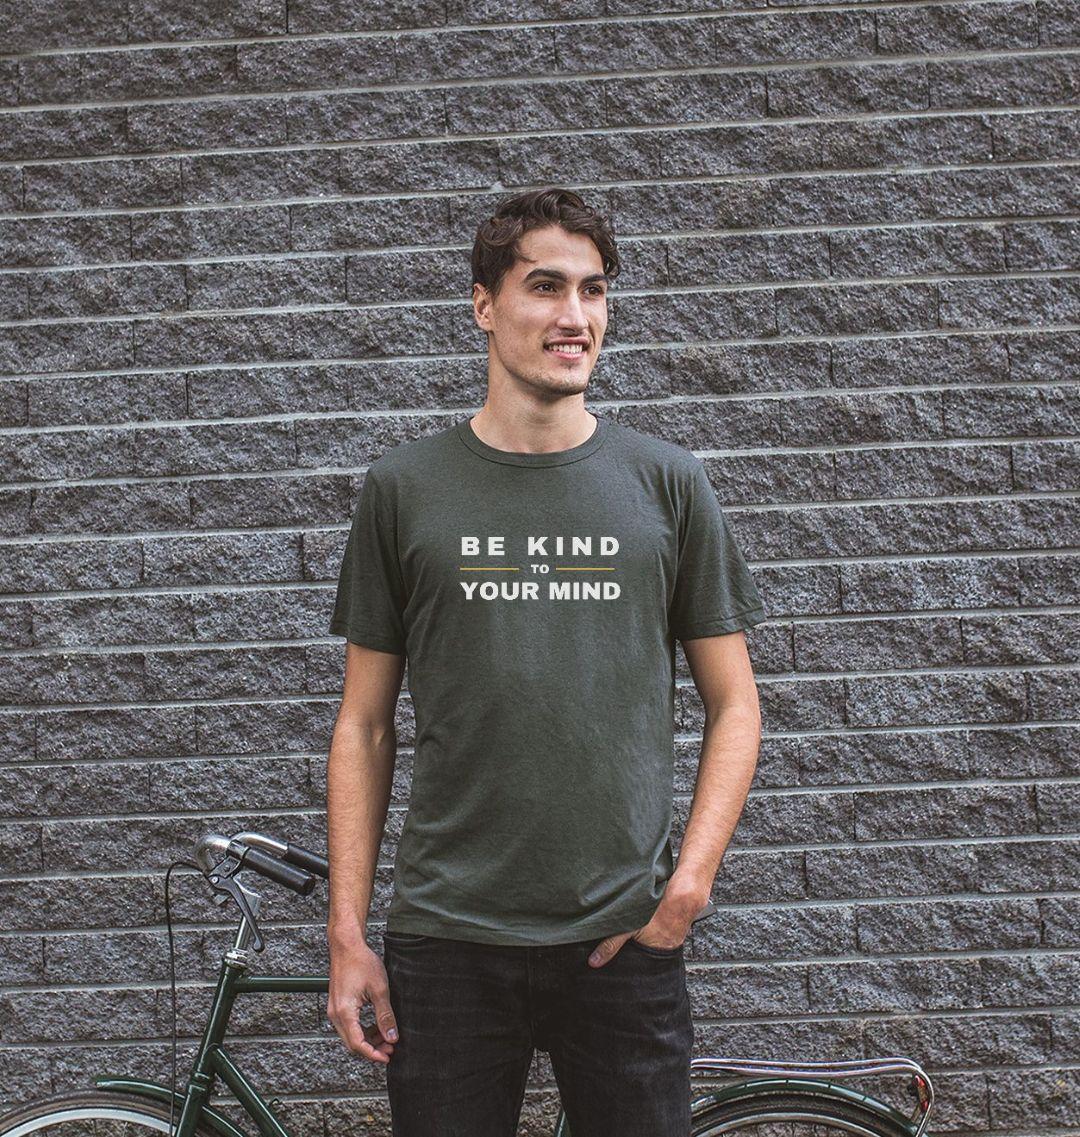 BE KIND TO YOUR MIND Mens Mental Health T-shirt Top – Organic Cotton, Vegan Kind Shop 3